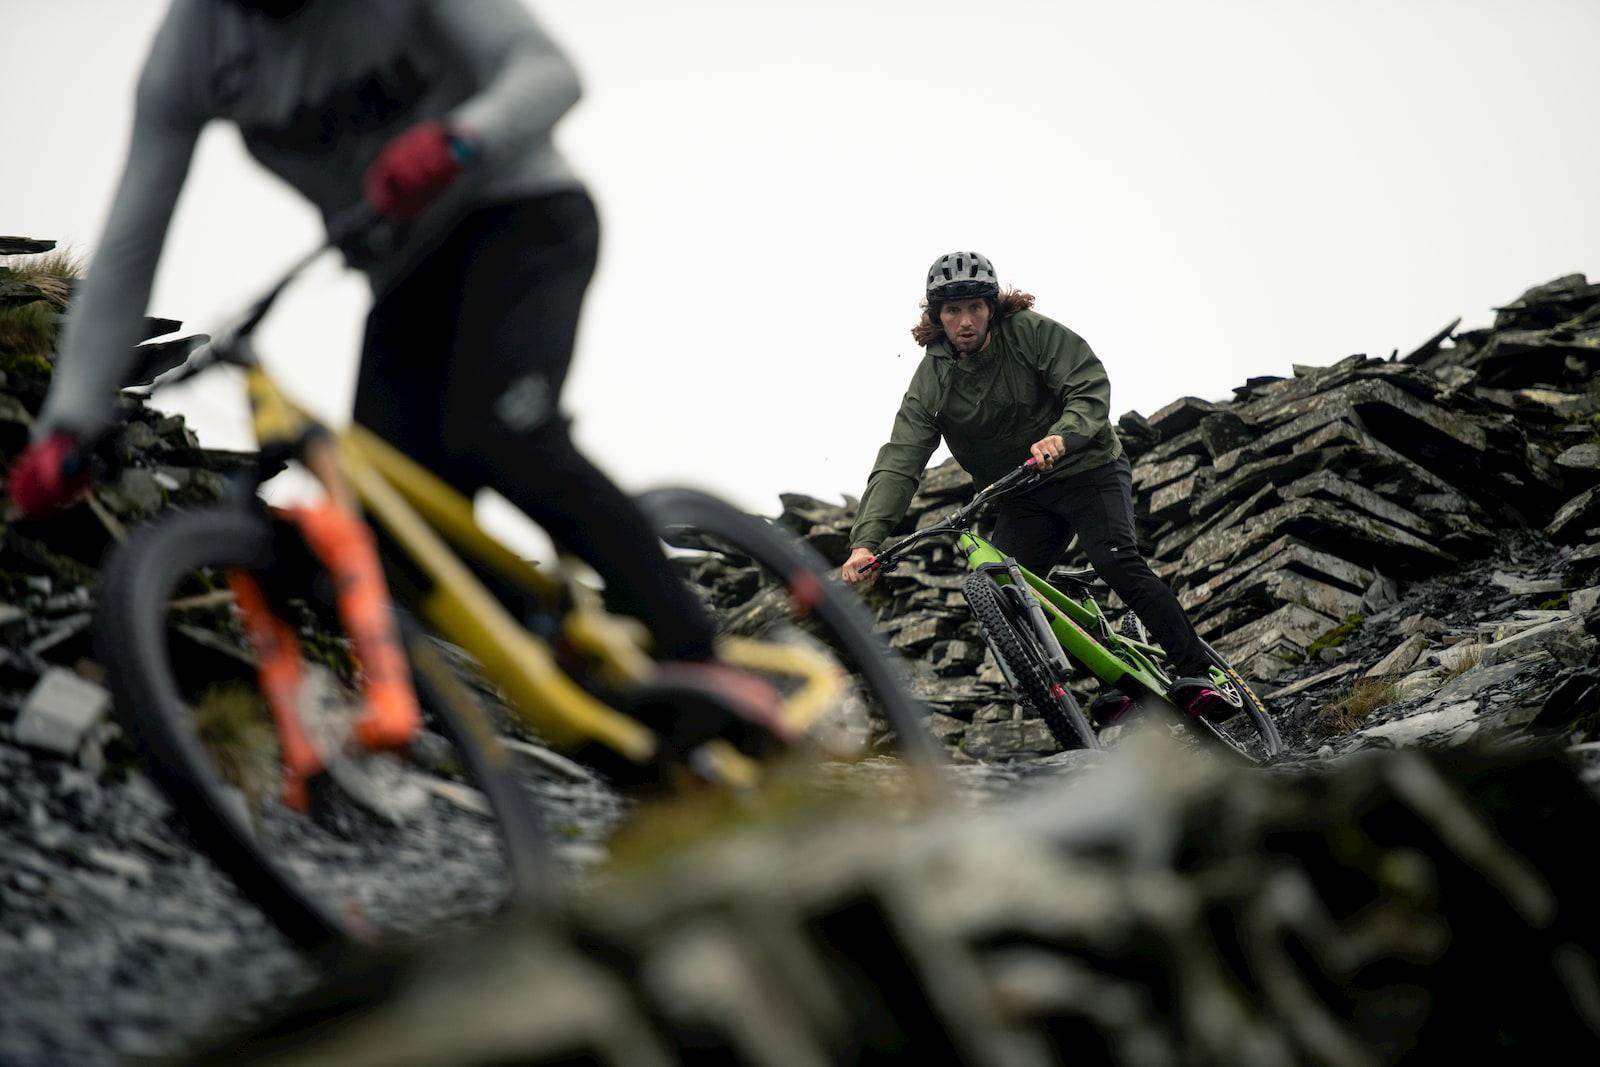 Santa Cruz Nomad enduro bike review